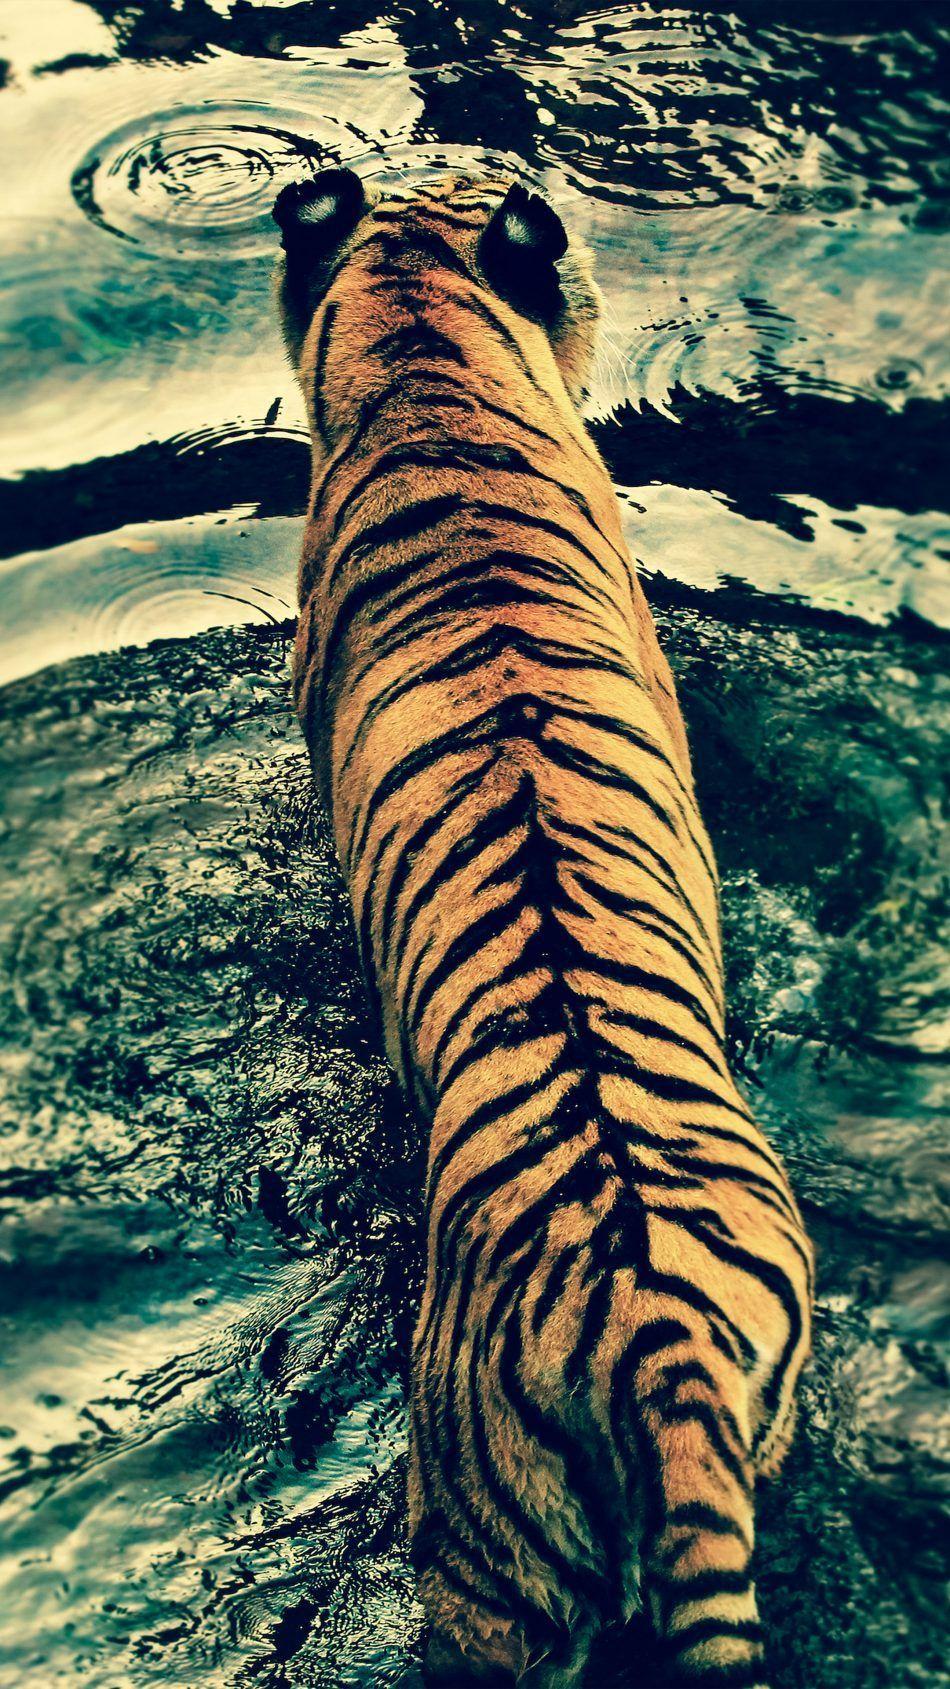 Iphone Ultra Hd Animal Wallpaper Hd Http Wallpapersalbum Com Iphone Ultra Hd Animal Wallpaper Hd Html In 2020 Tiger In Water Animal Wallpaper Animals